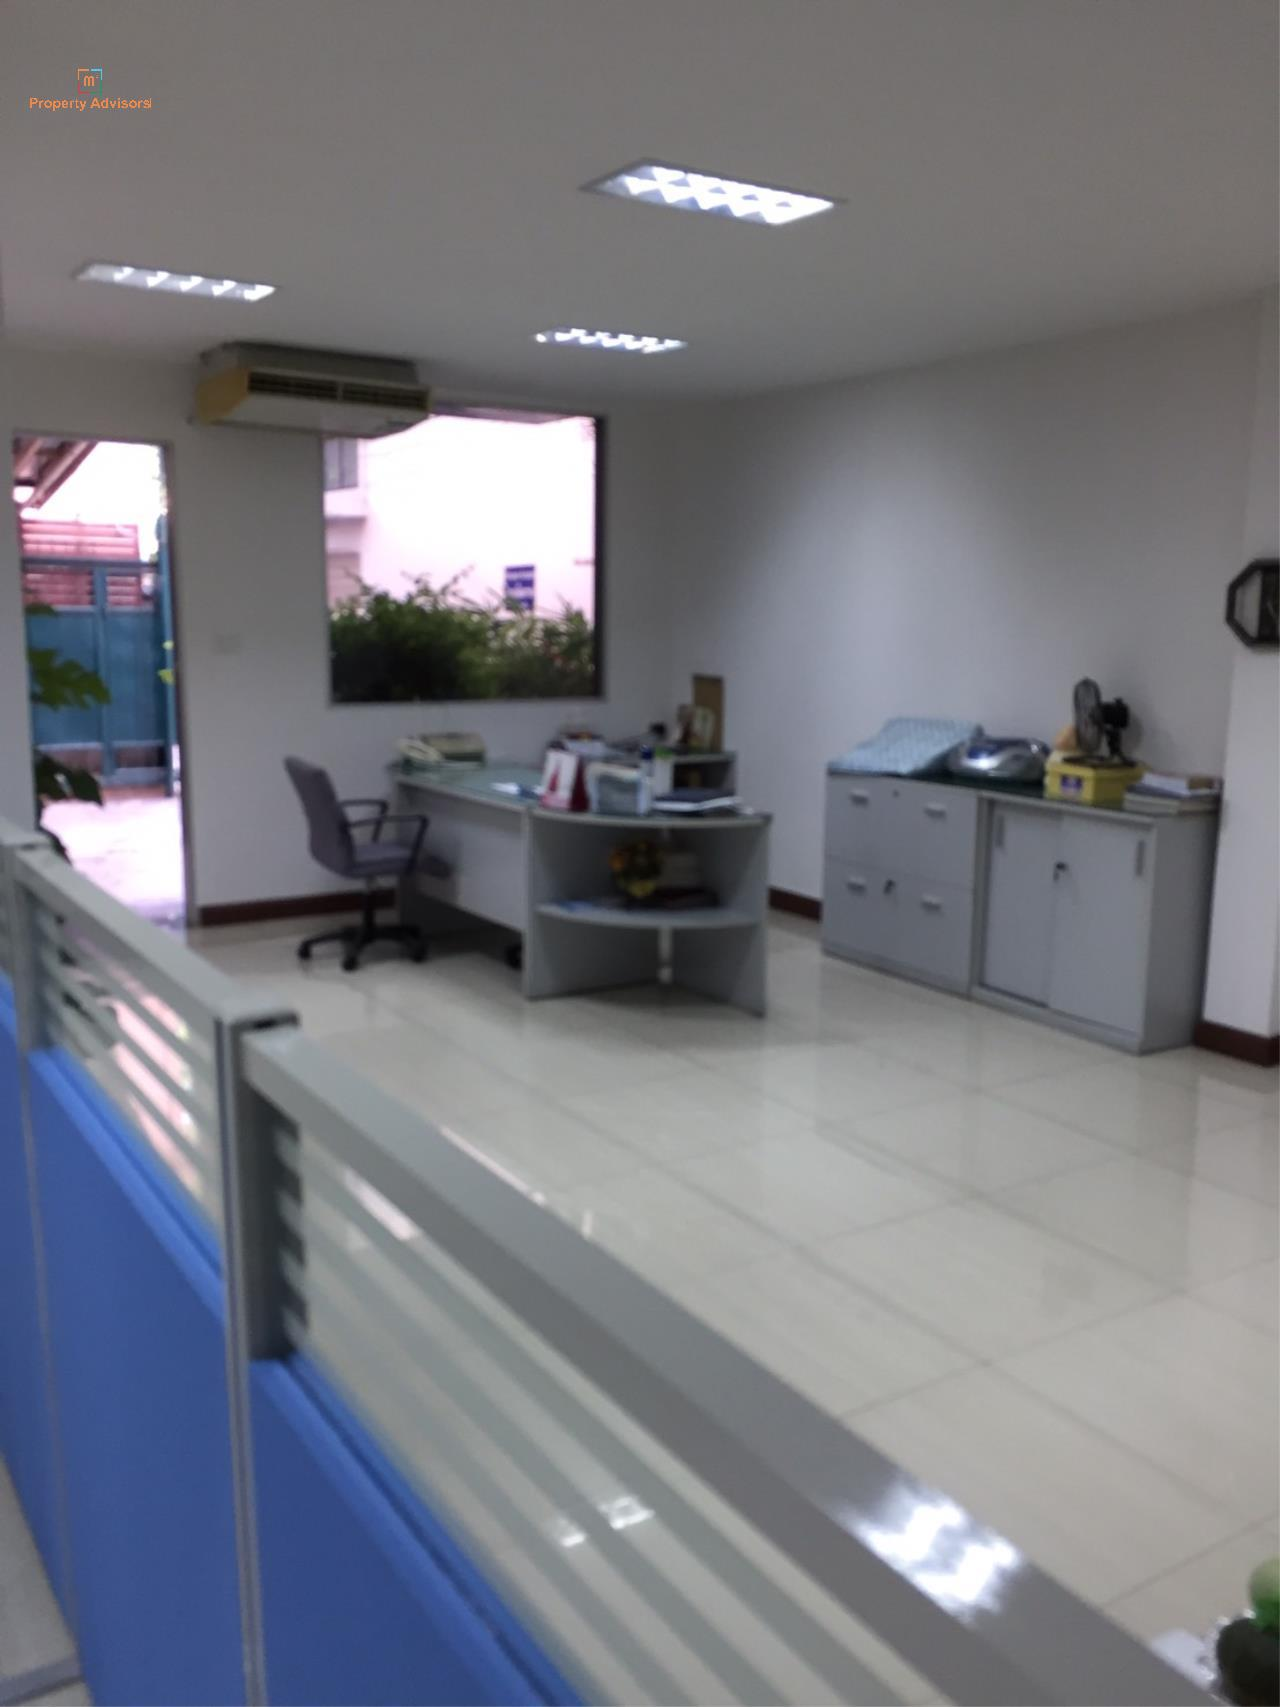 m2 Property Advisors Agency's Sathupradit soi 19 office building. 1